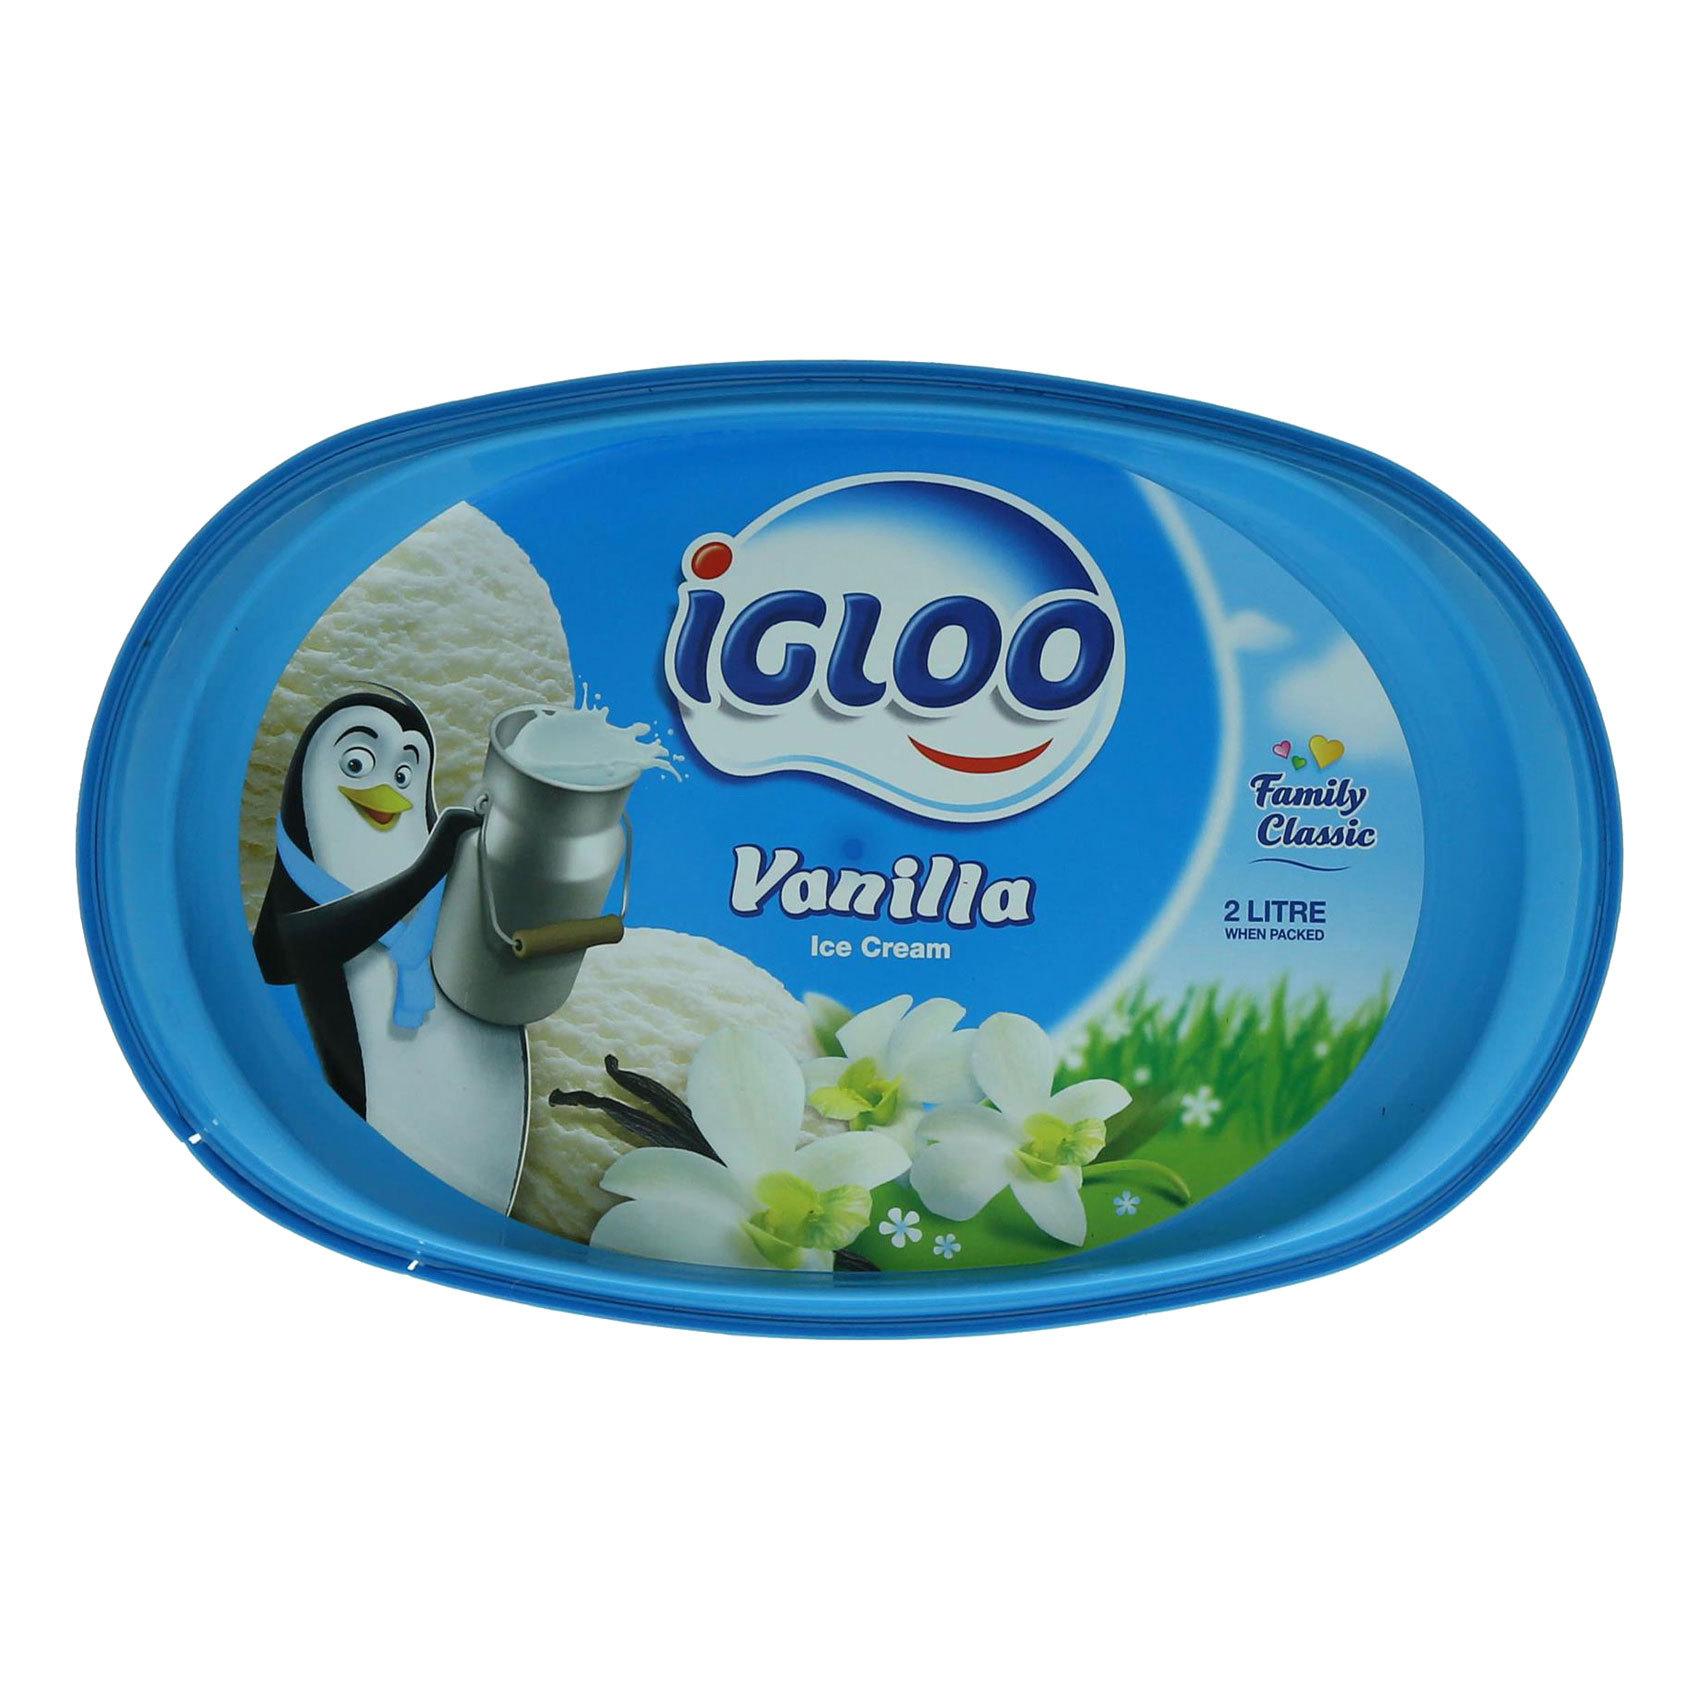 IGLOO ICE CREAM VANILLA 2L